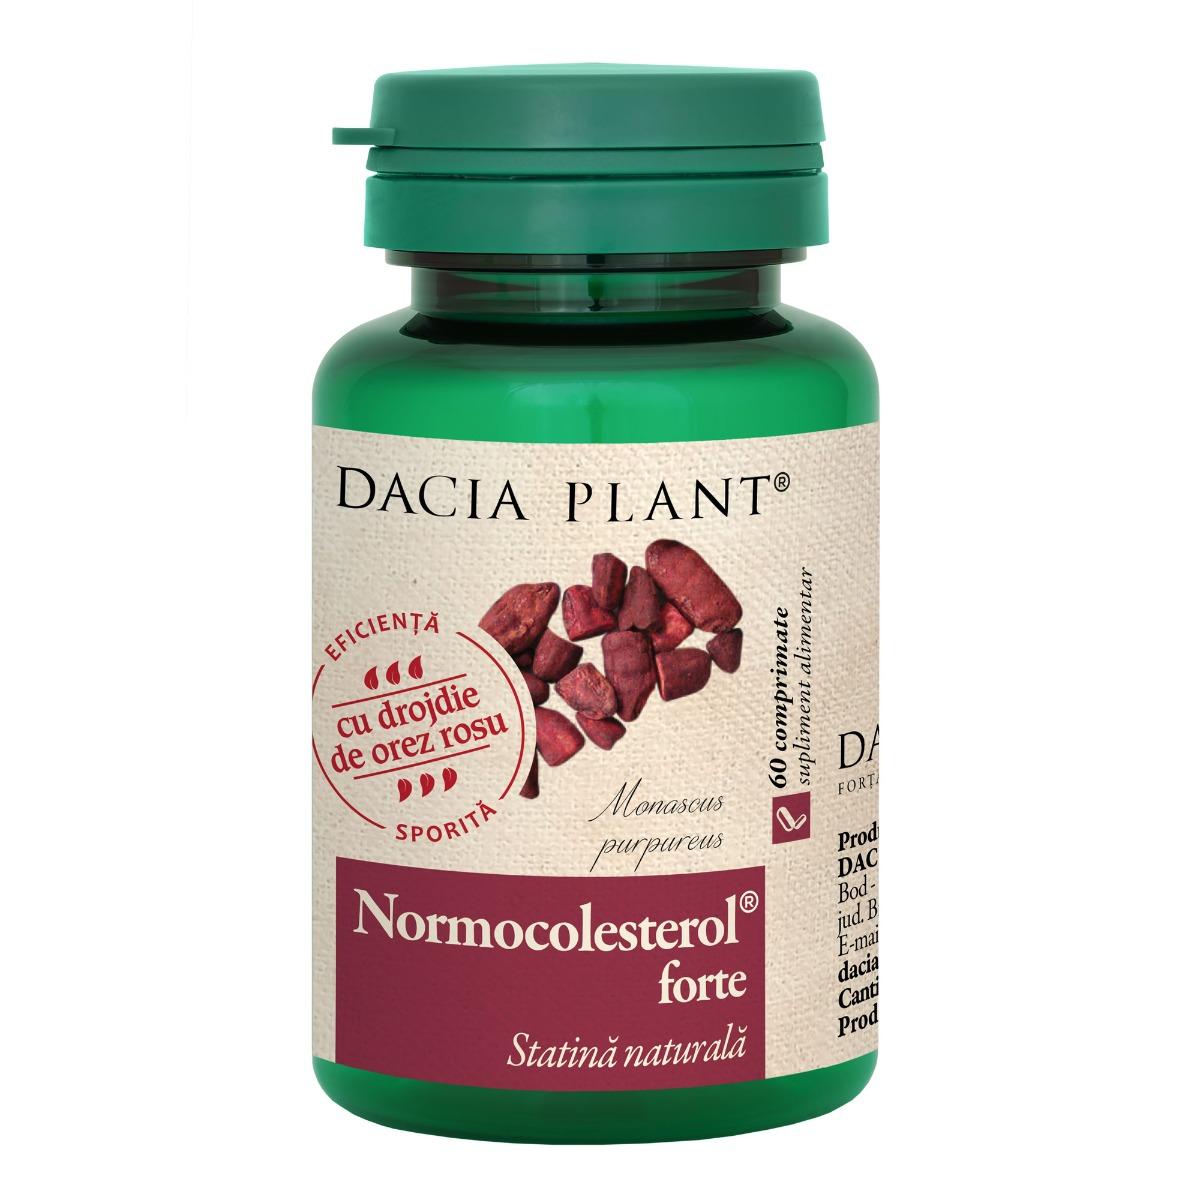 Normocolesterol forte, 60 comprimate, Dacia Plant drmax.ro